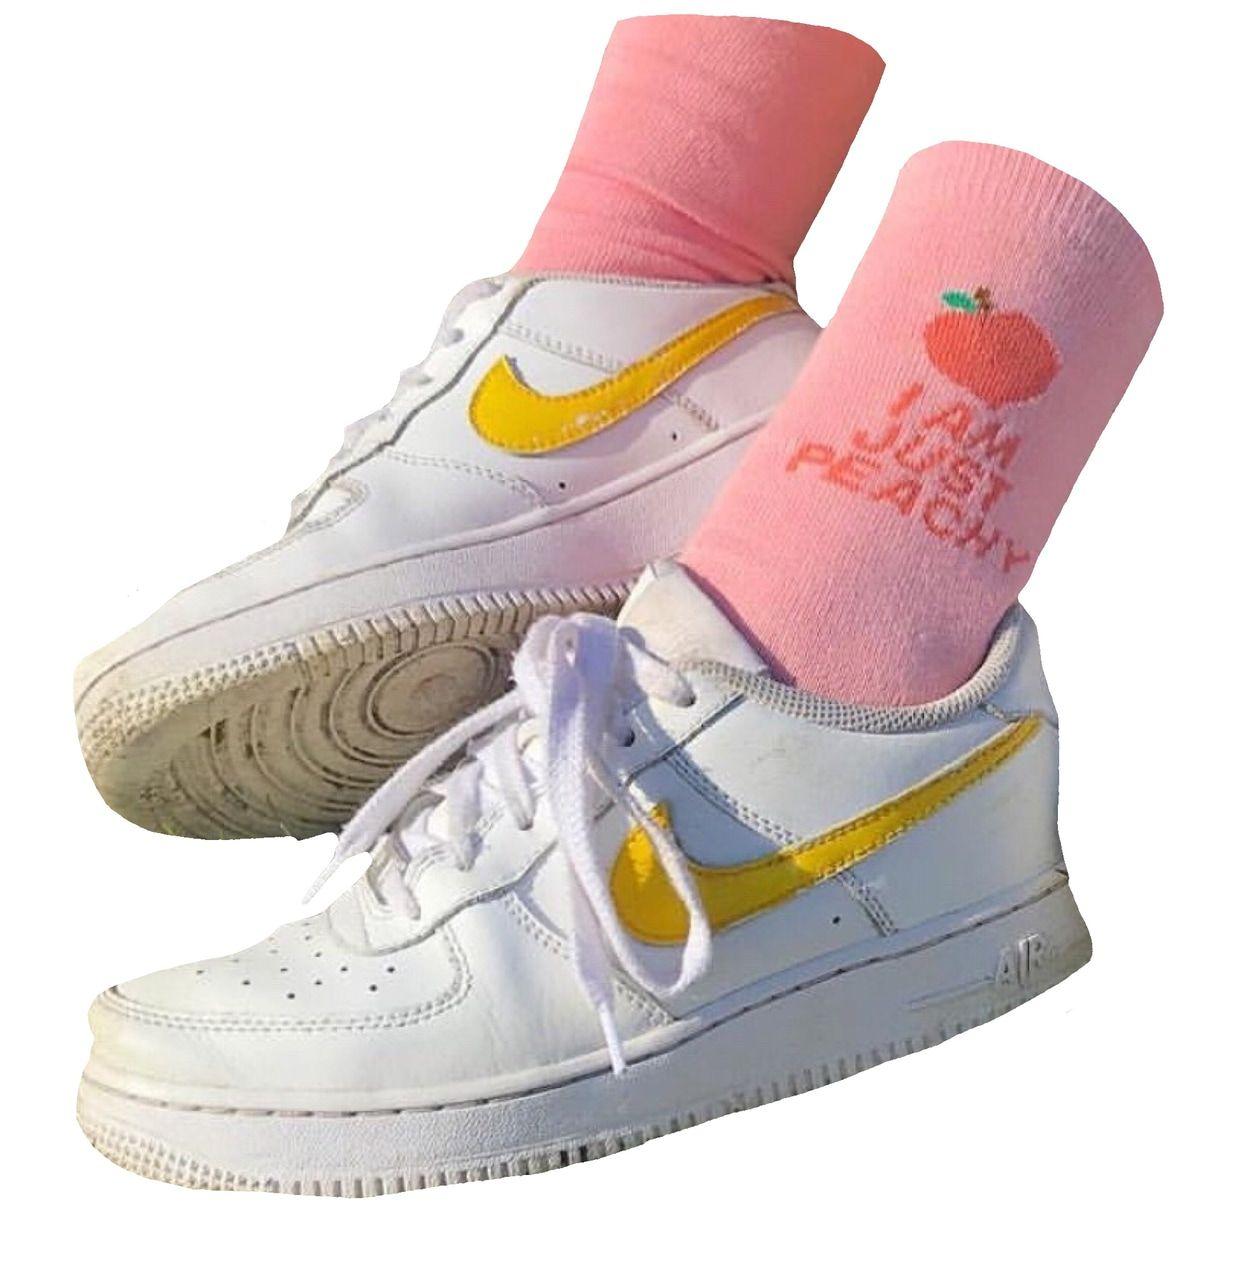 Thye Human Hyeart Iѕ ѕuch A Tryeachyersuѕ Thing G R A C E E V E T T E Nike Shoes Outfits Nike Shoes Girls Kids Nike Shoes Girls